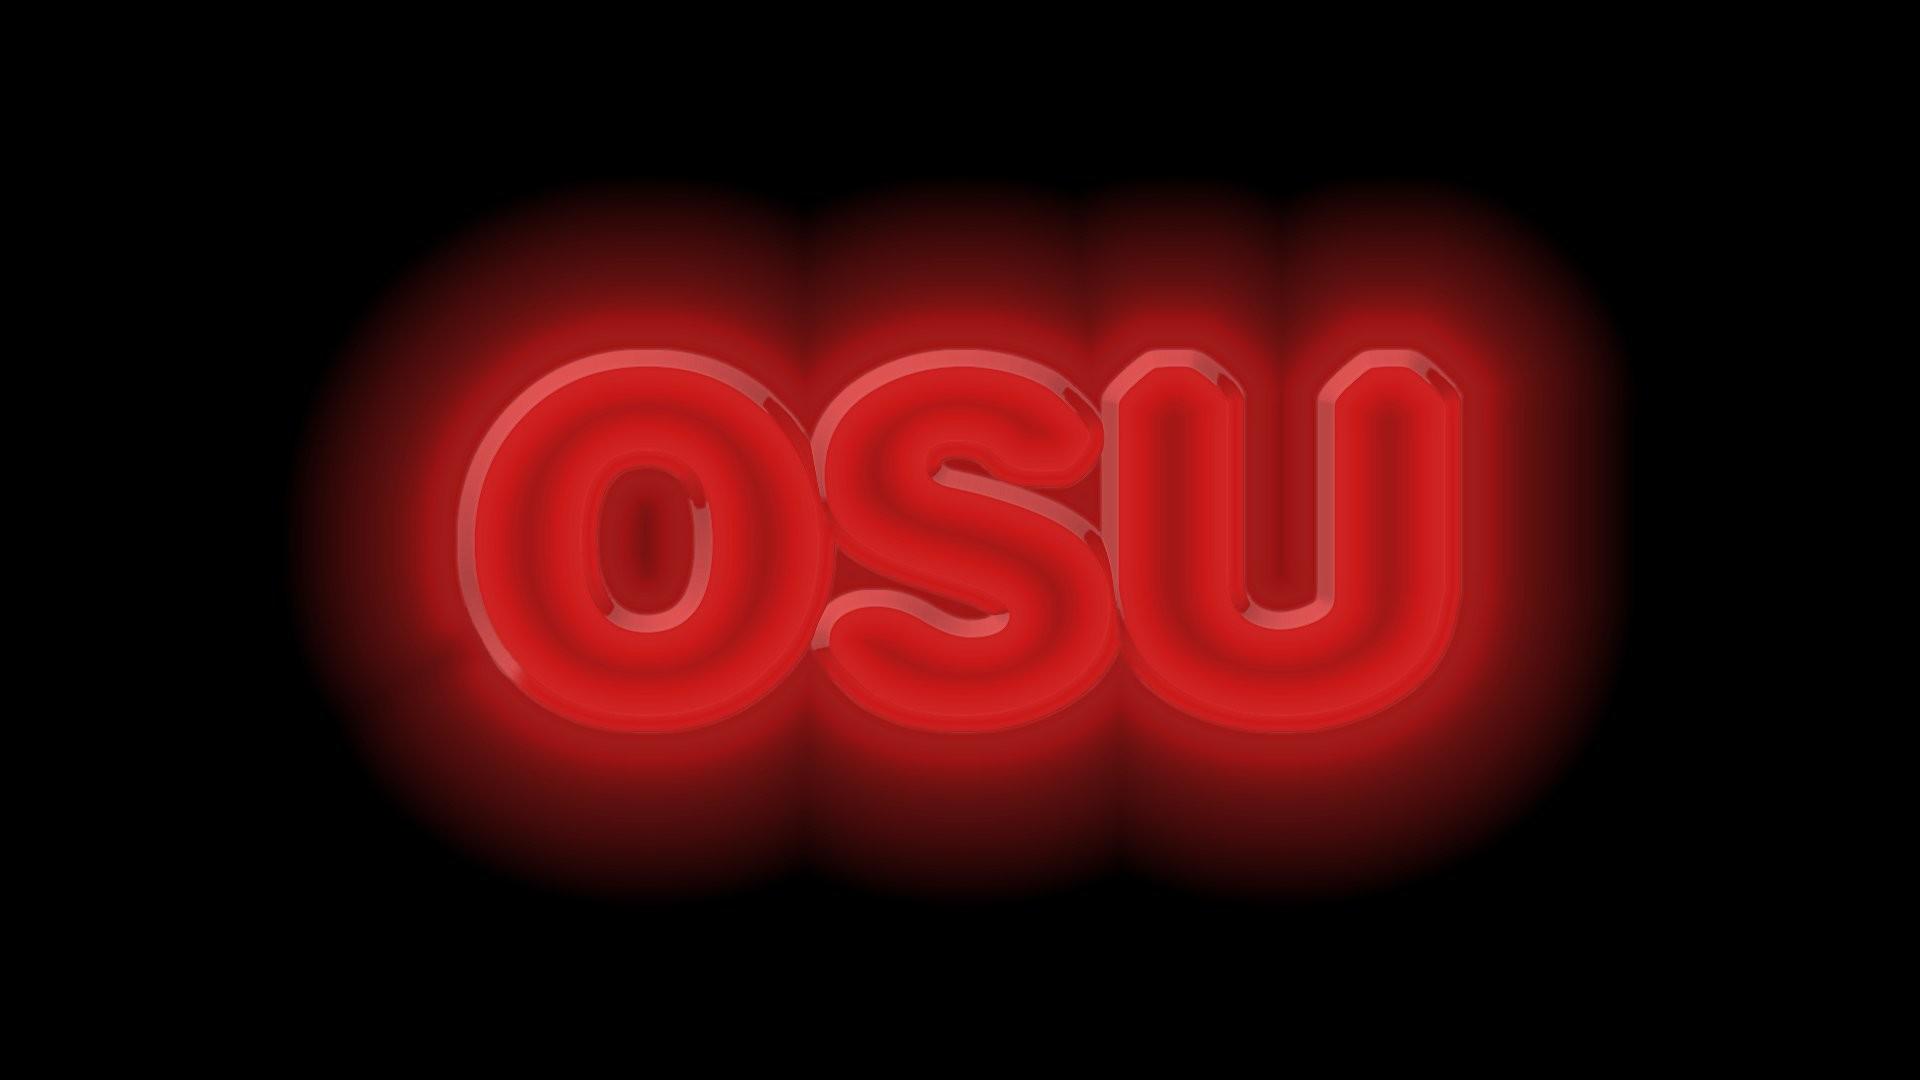 OSU Wallpaper 34